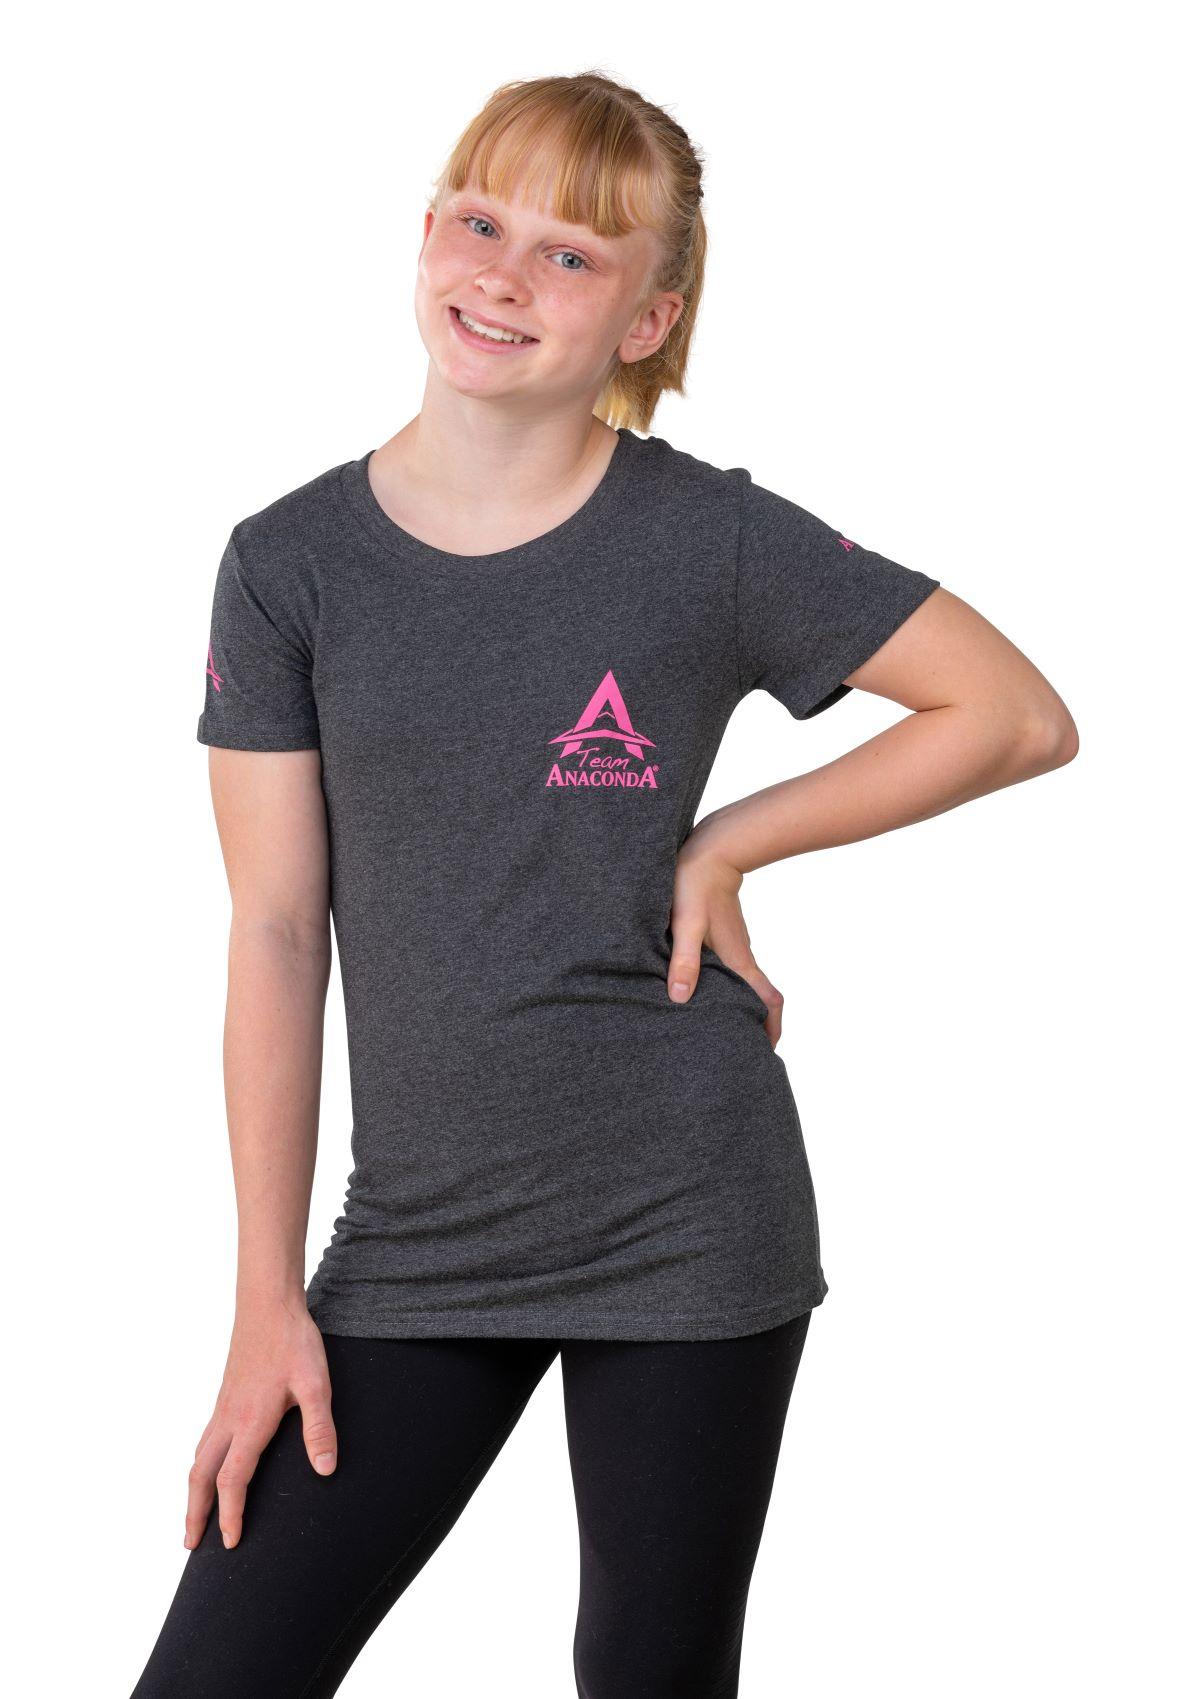 Anaconda dámské tričko Lady Team XS